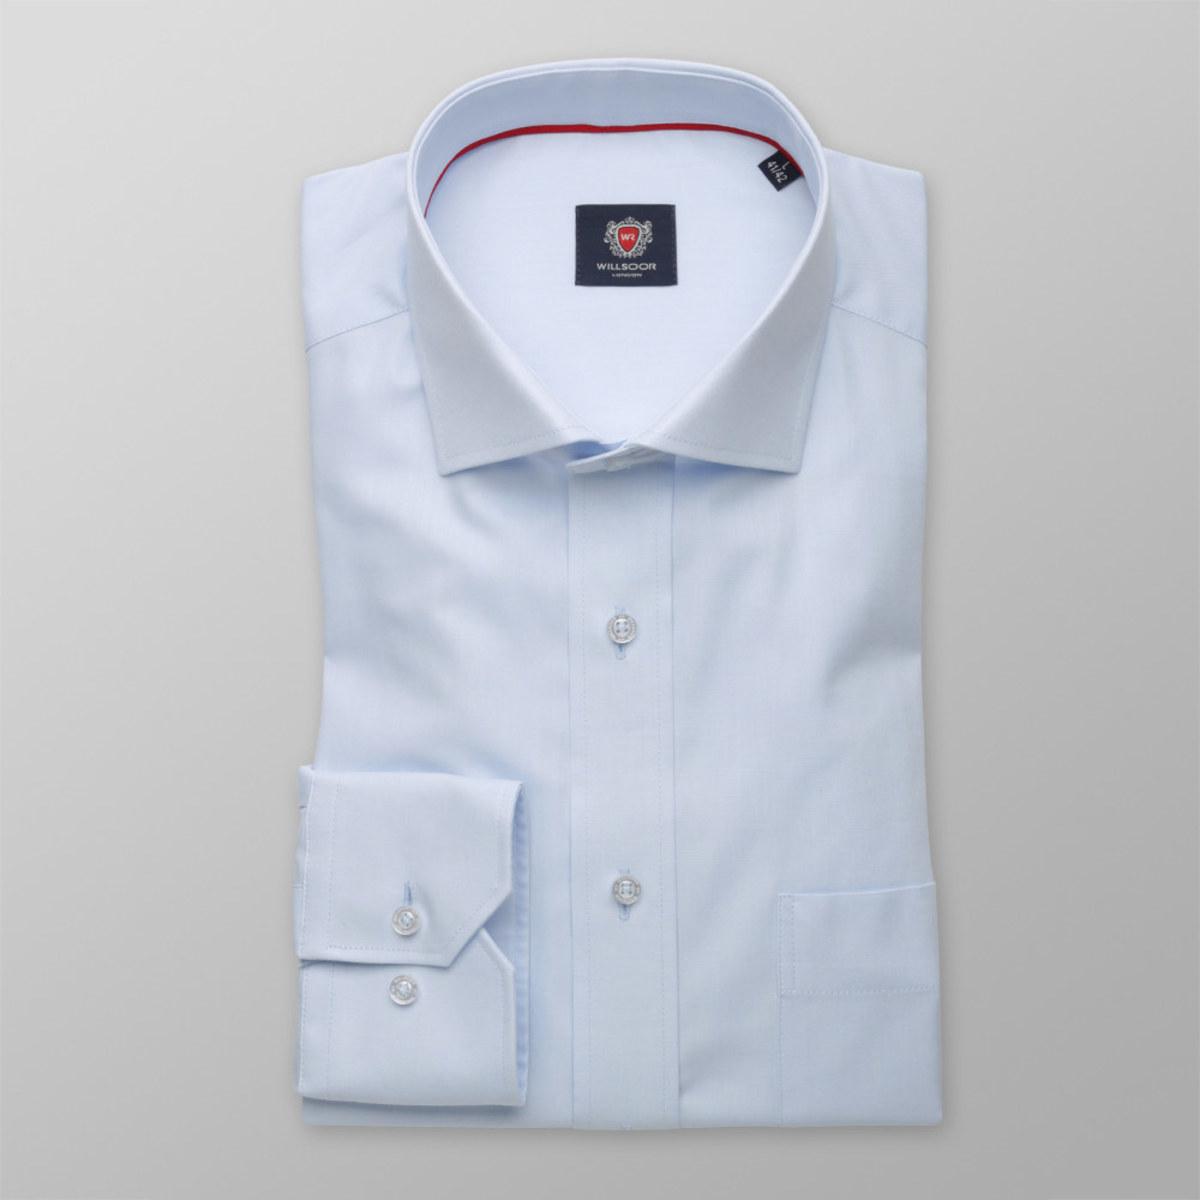 Pánska klasická košeľa London (výška 176-182) 8779 176-182 / L (41/42)